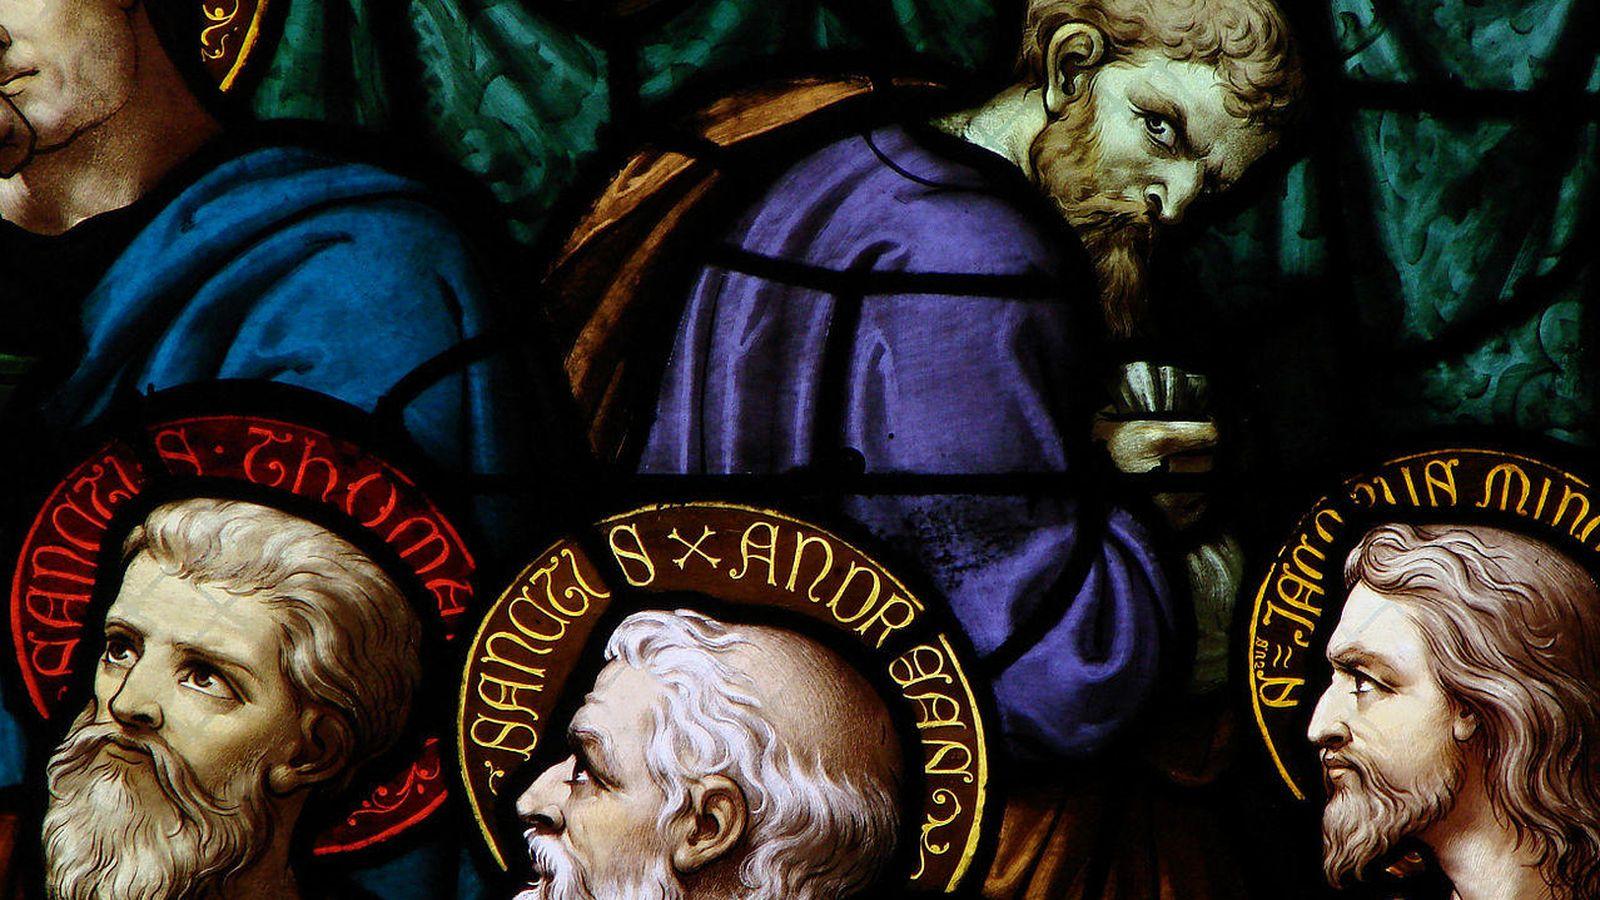 Foto: Judas, en un detalle de la vidriera de la Catedral de Moulins, en Francia (CC/Vassil)